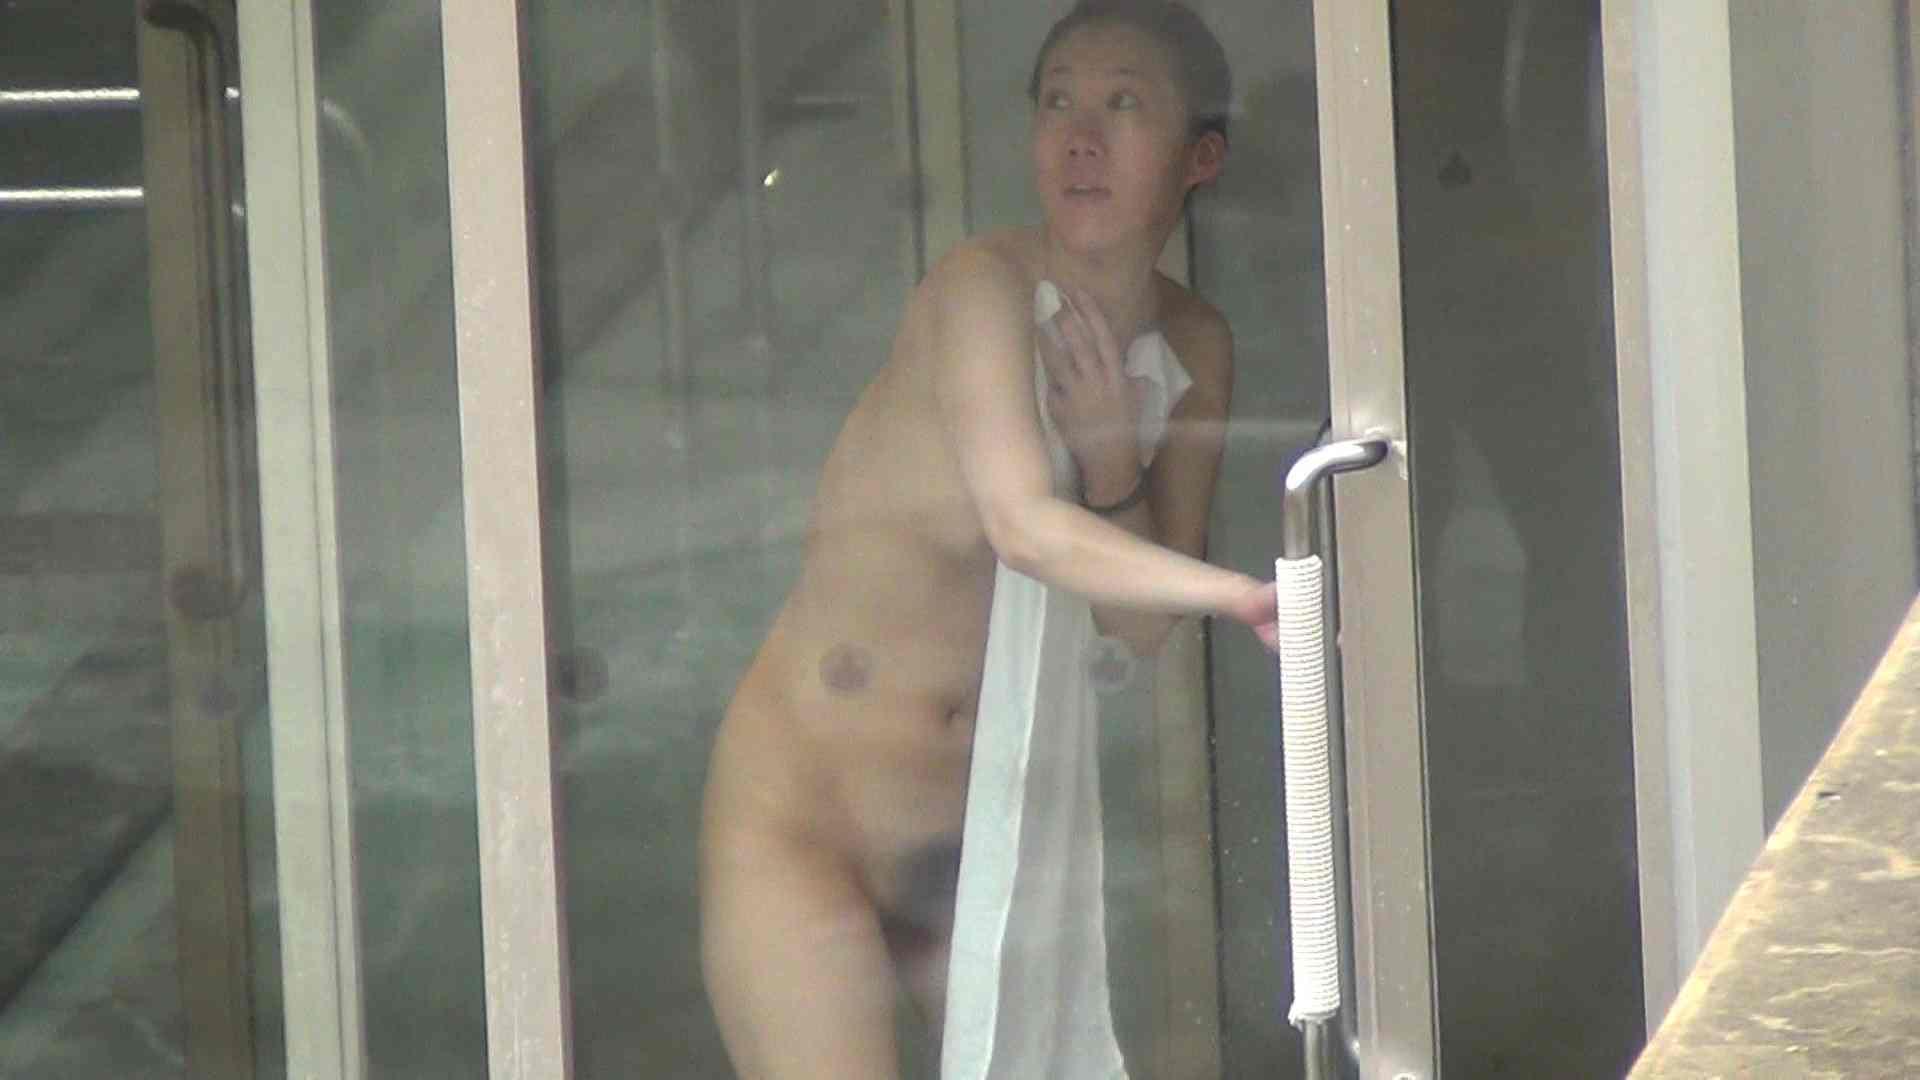 Aquaな露天風呂Vol.241 ガールの盗撮 性交動画流出 107枚